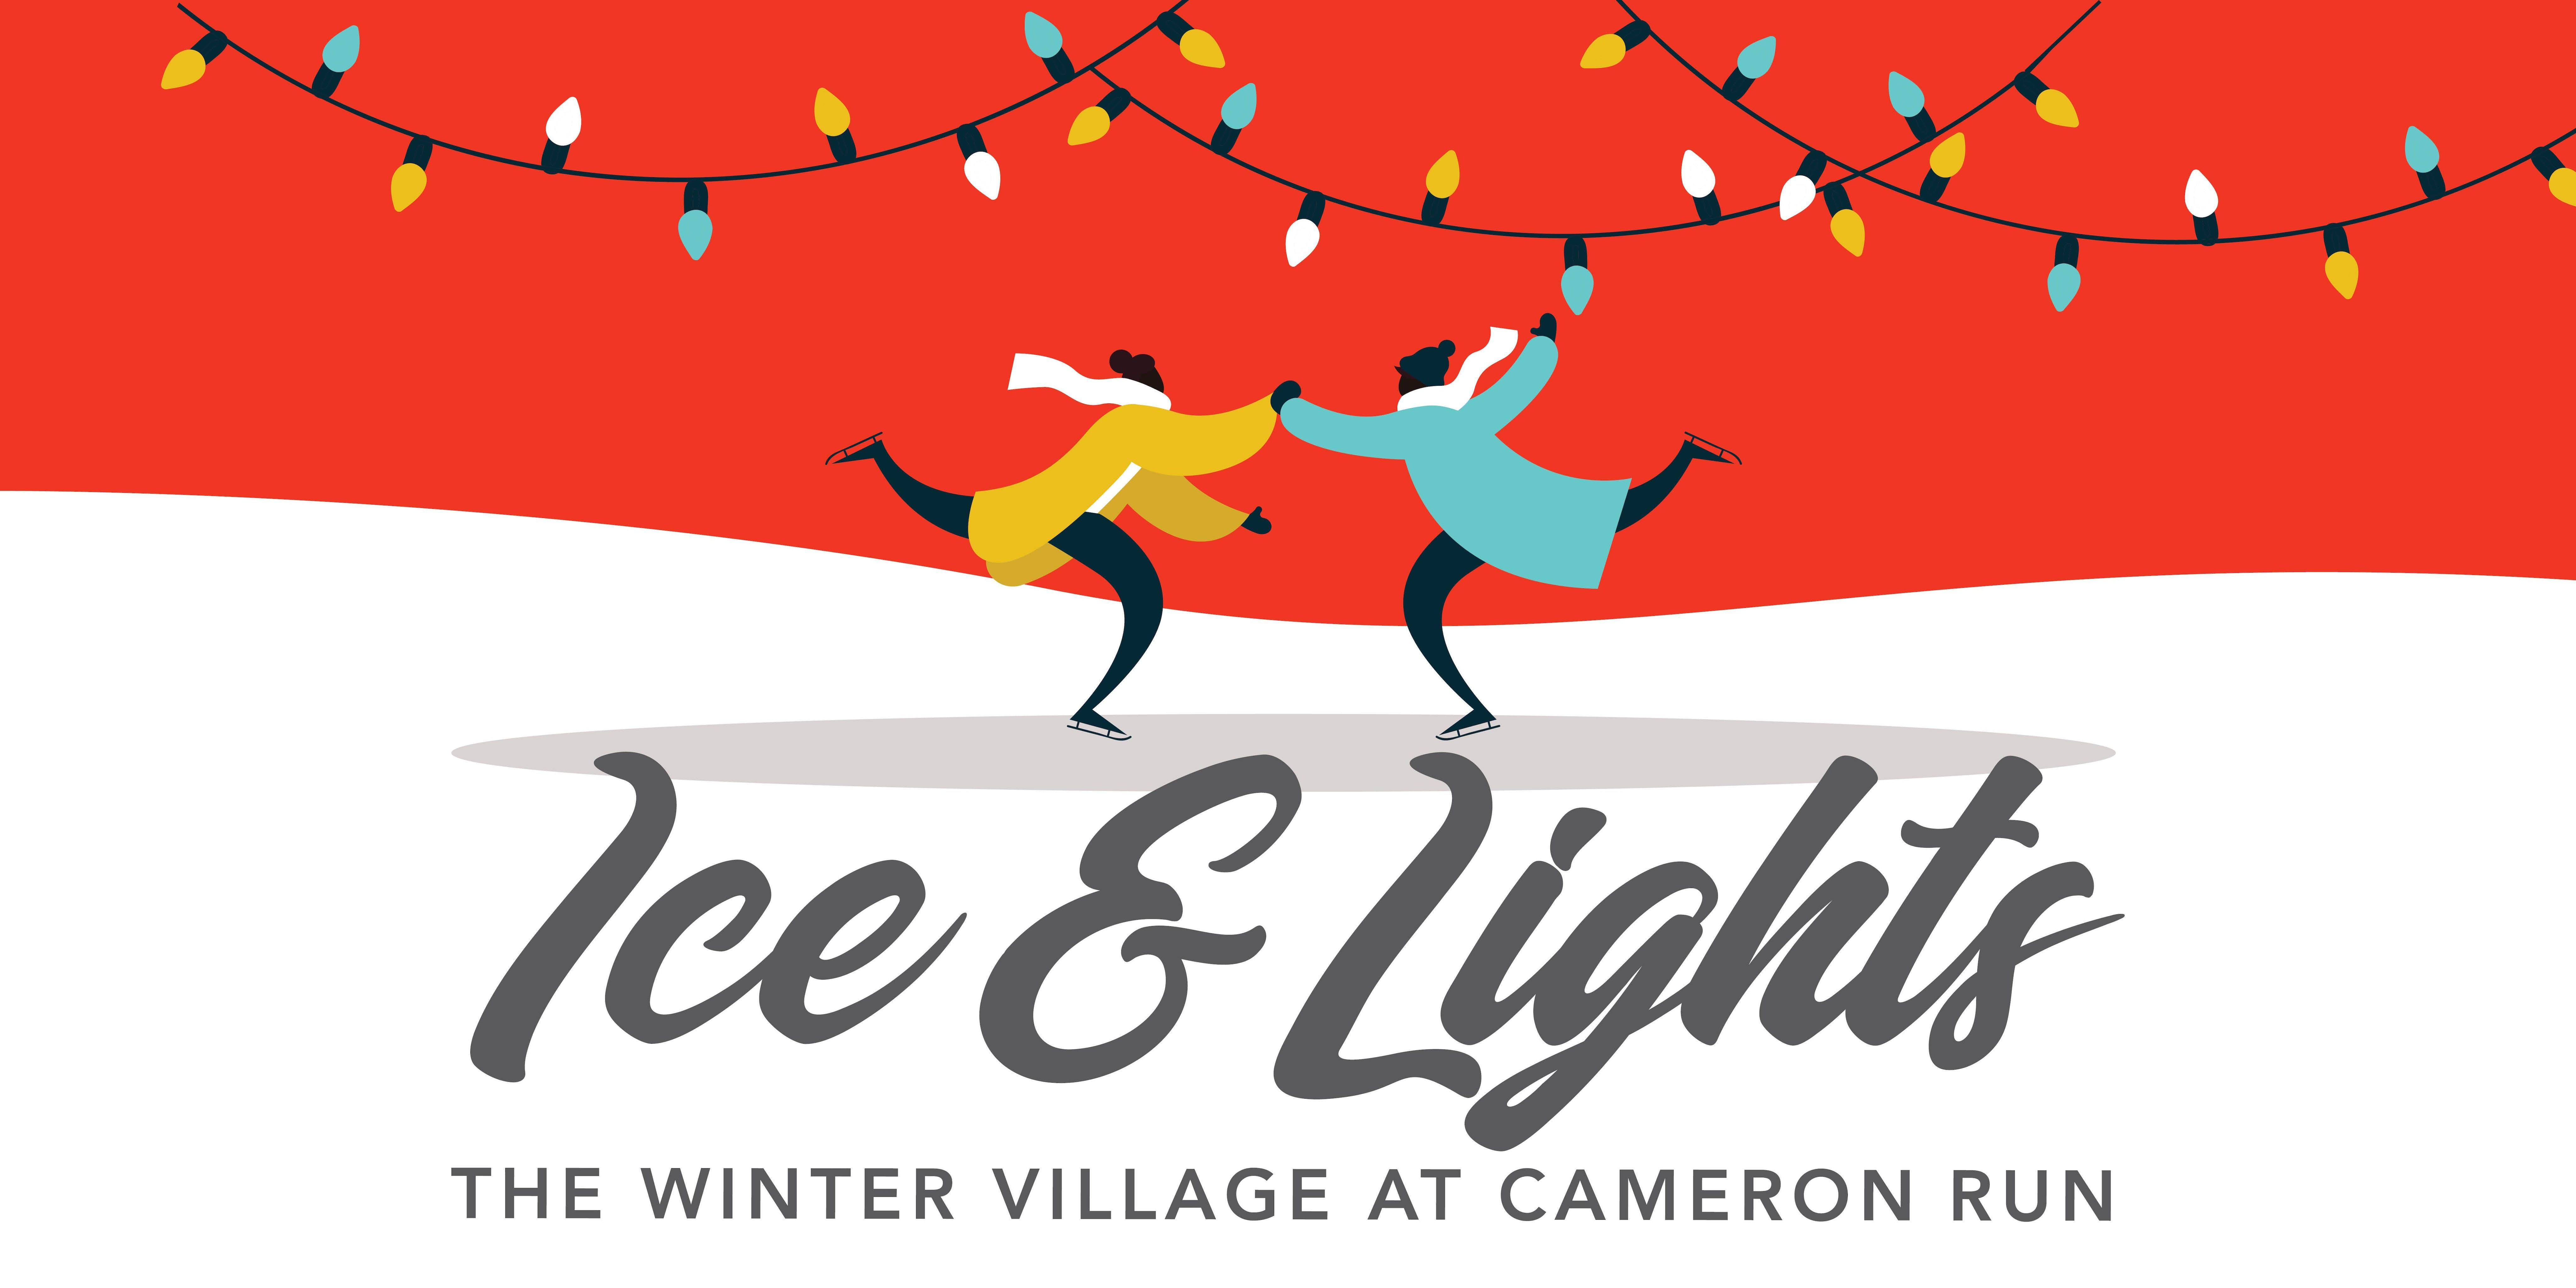 Ice & Lights: The Winter Village at Cameron Run